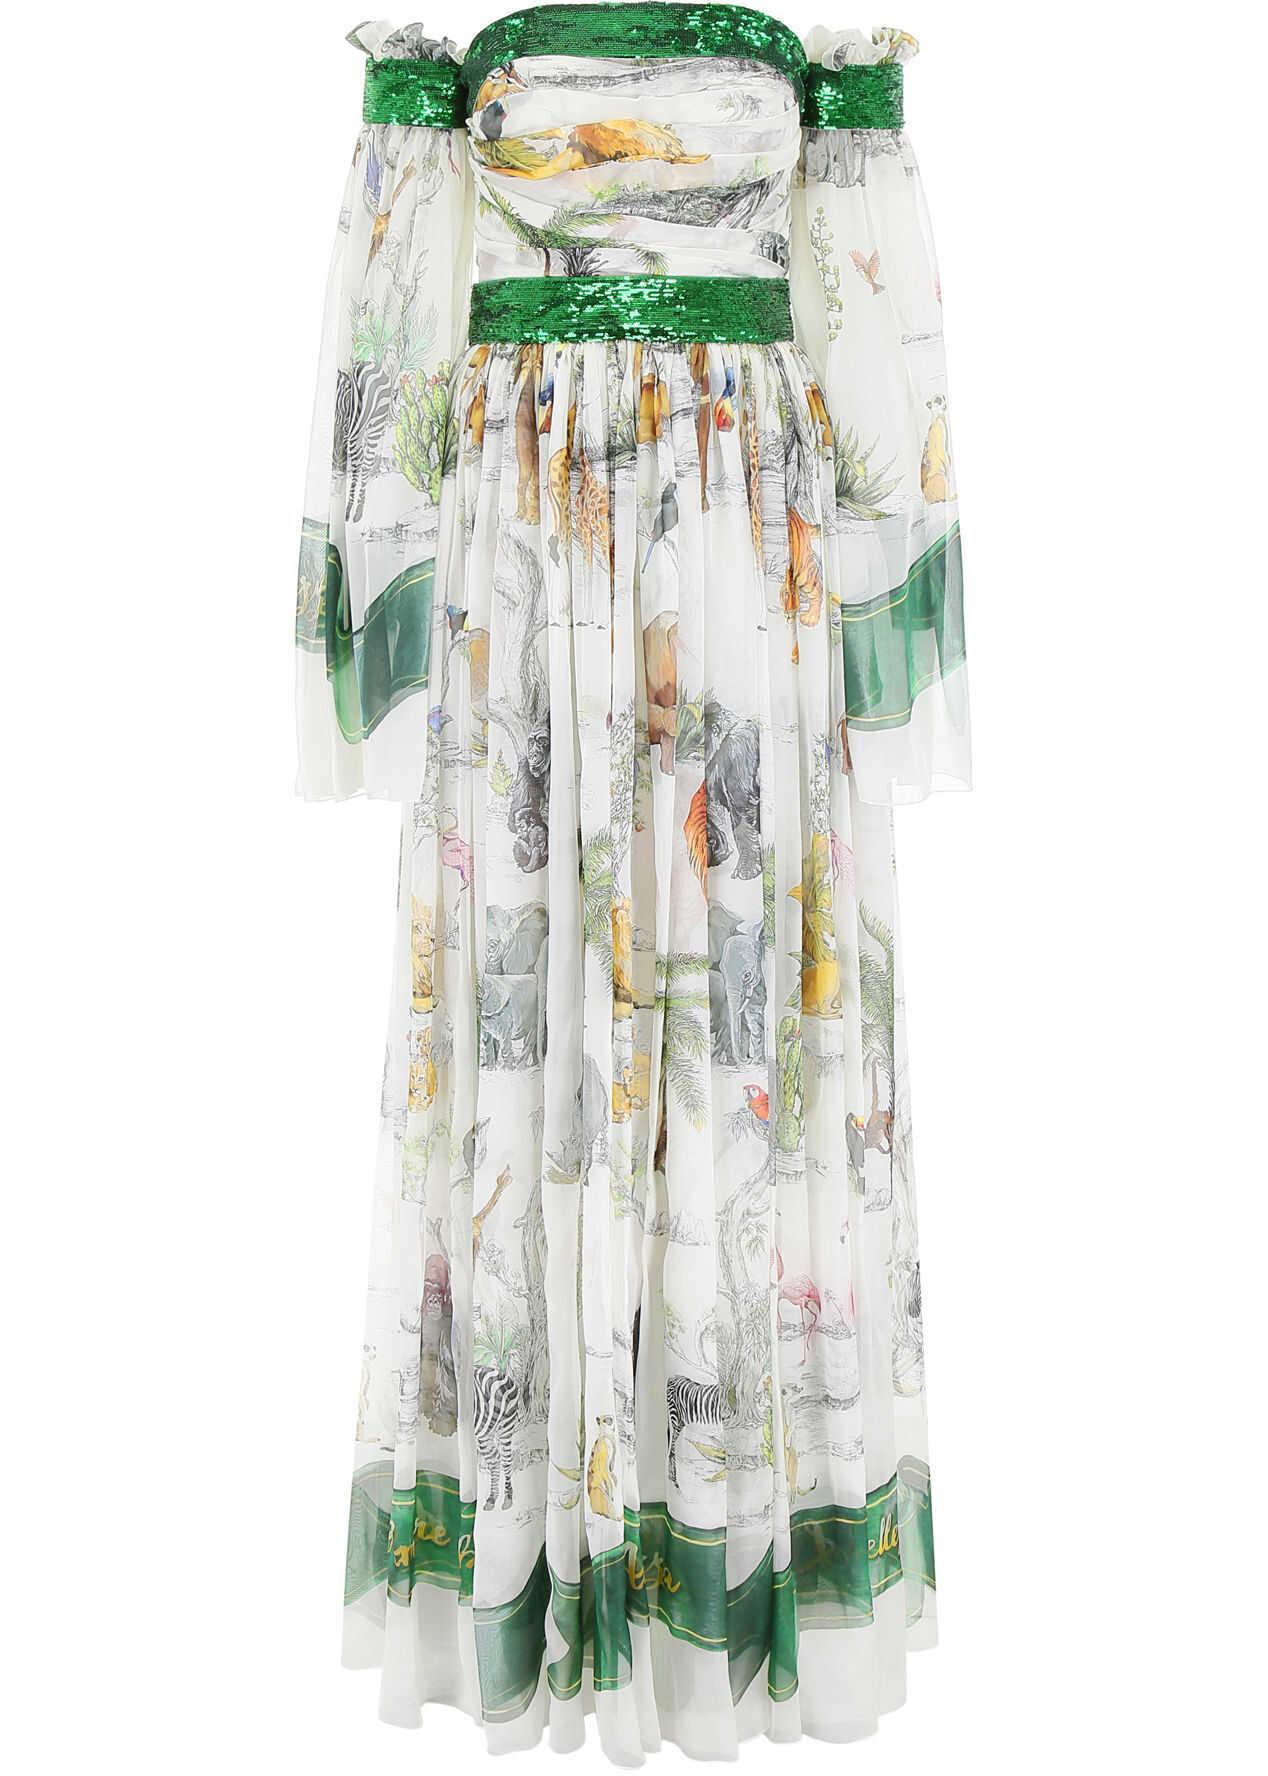 Dolce & Gabbana Printed Maxi Dress SAVANA FDO PANNA